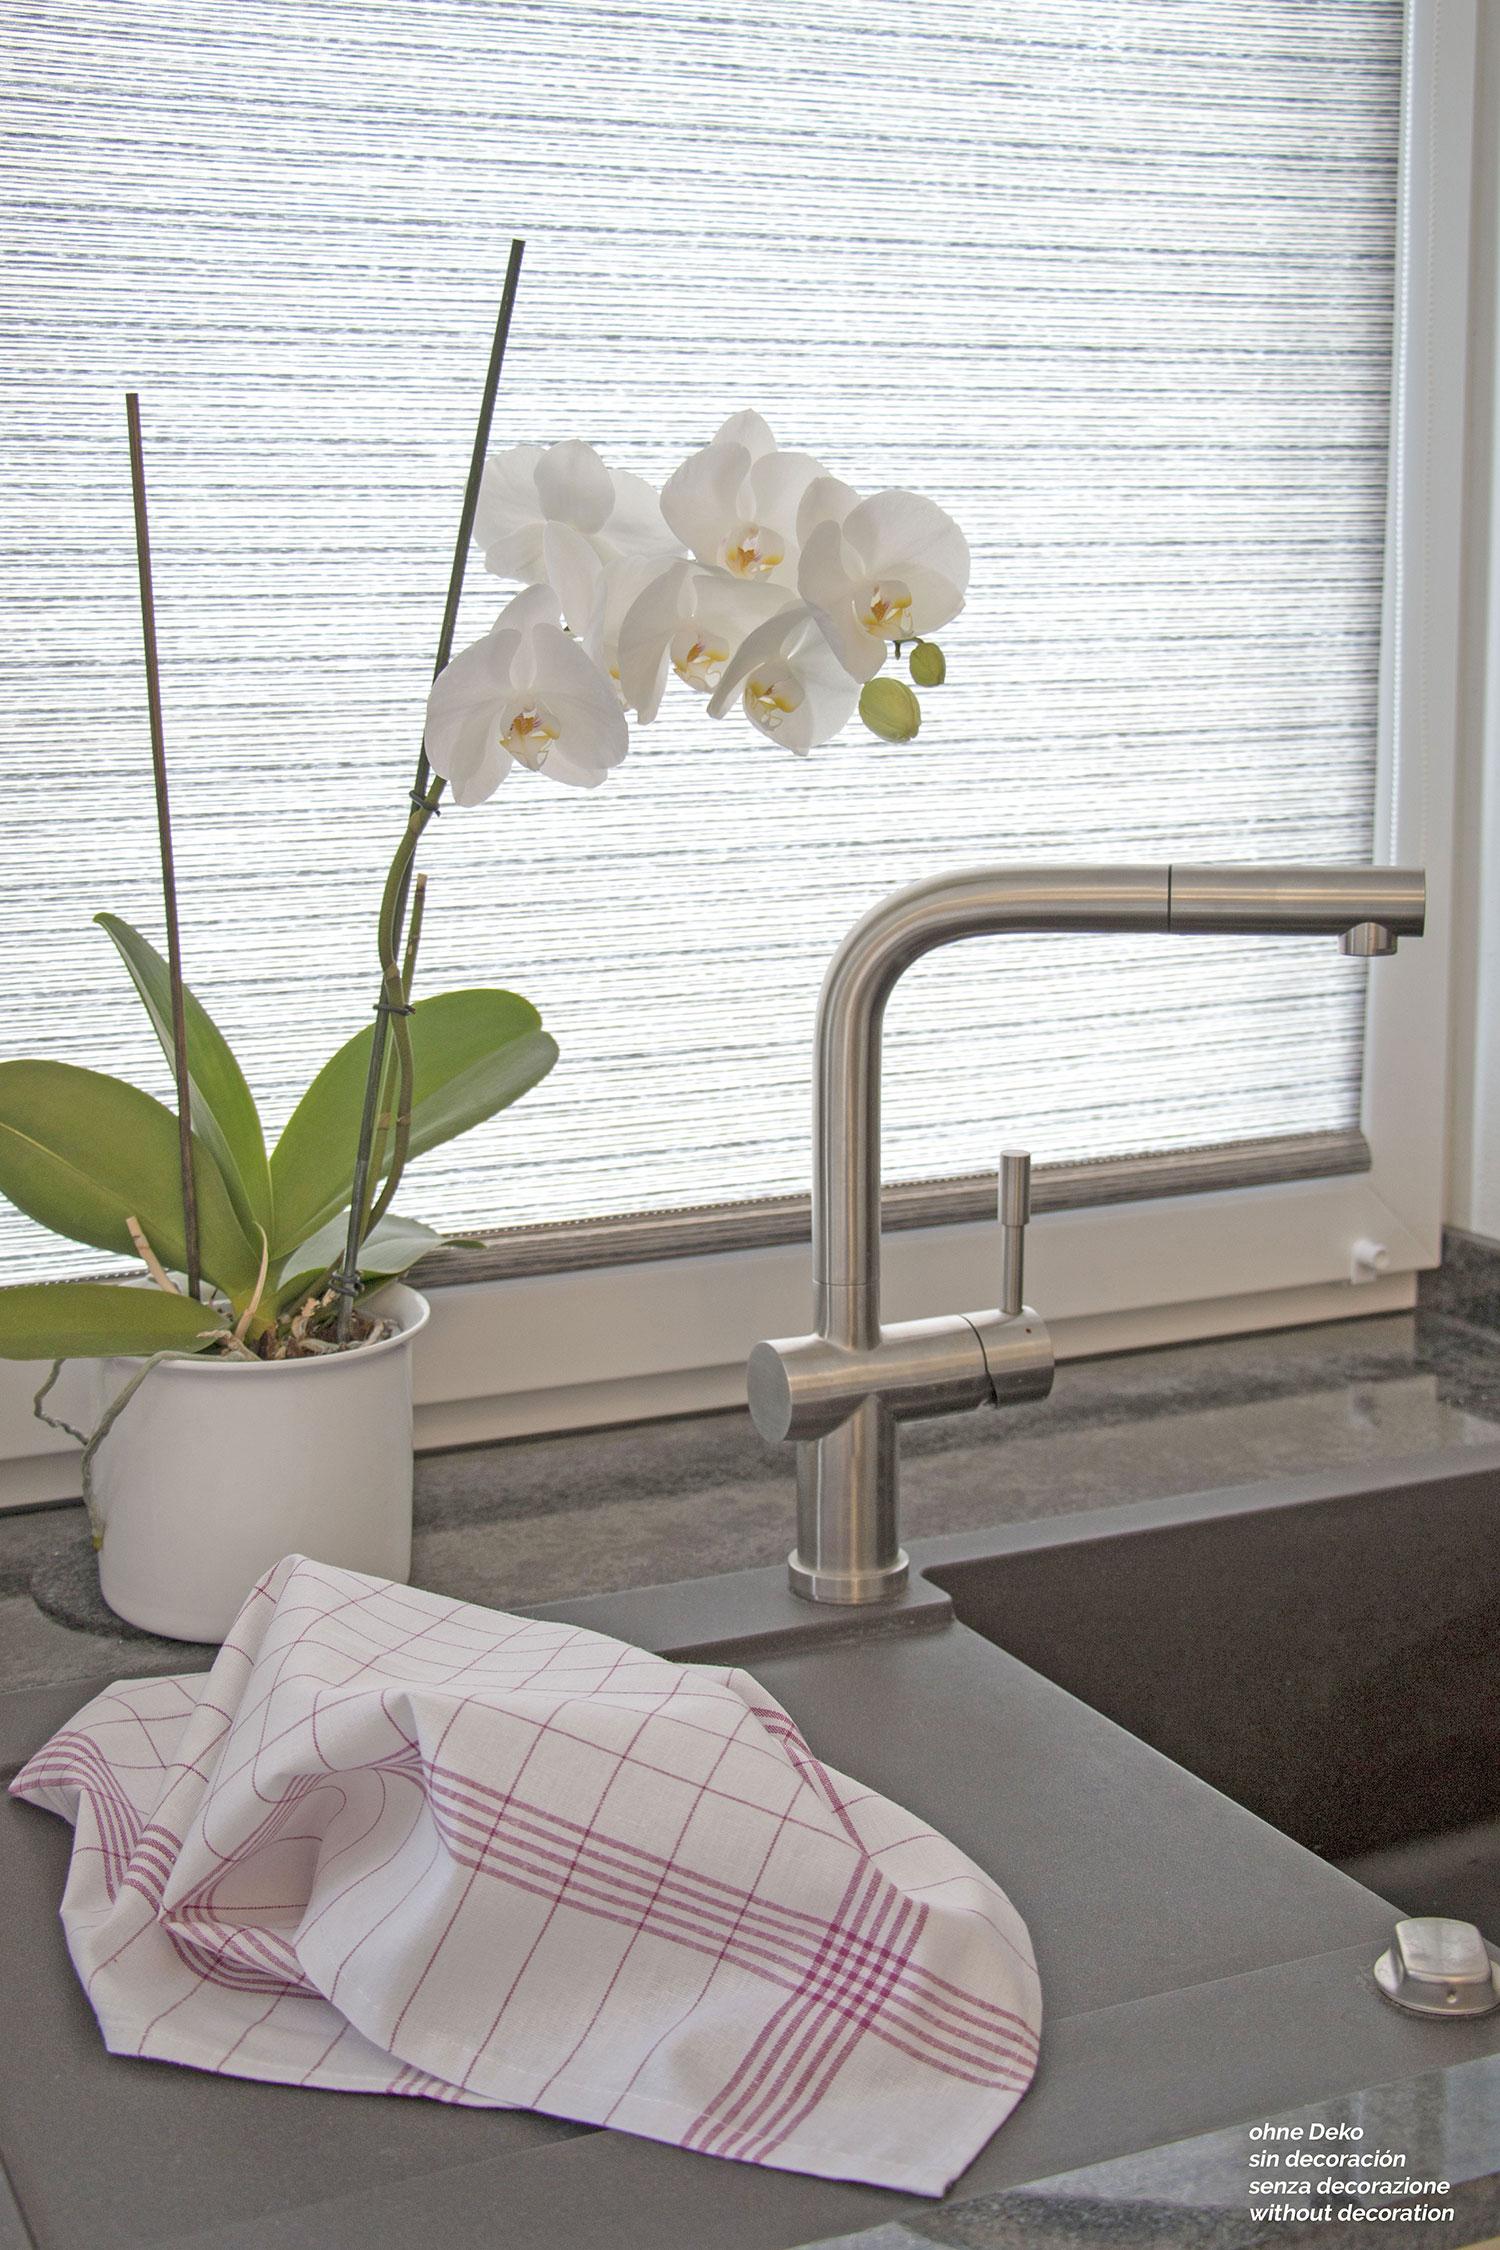 10er set geschirrt cher geschirrhandt cher trockent cher aus 100 baumwolle ebay. Black Bedroom Furniture Sets. Home Design Ideas